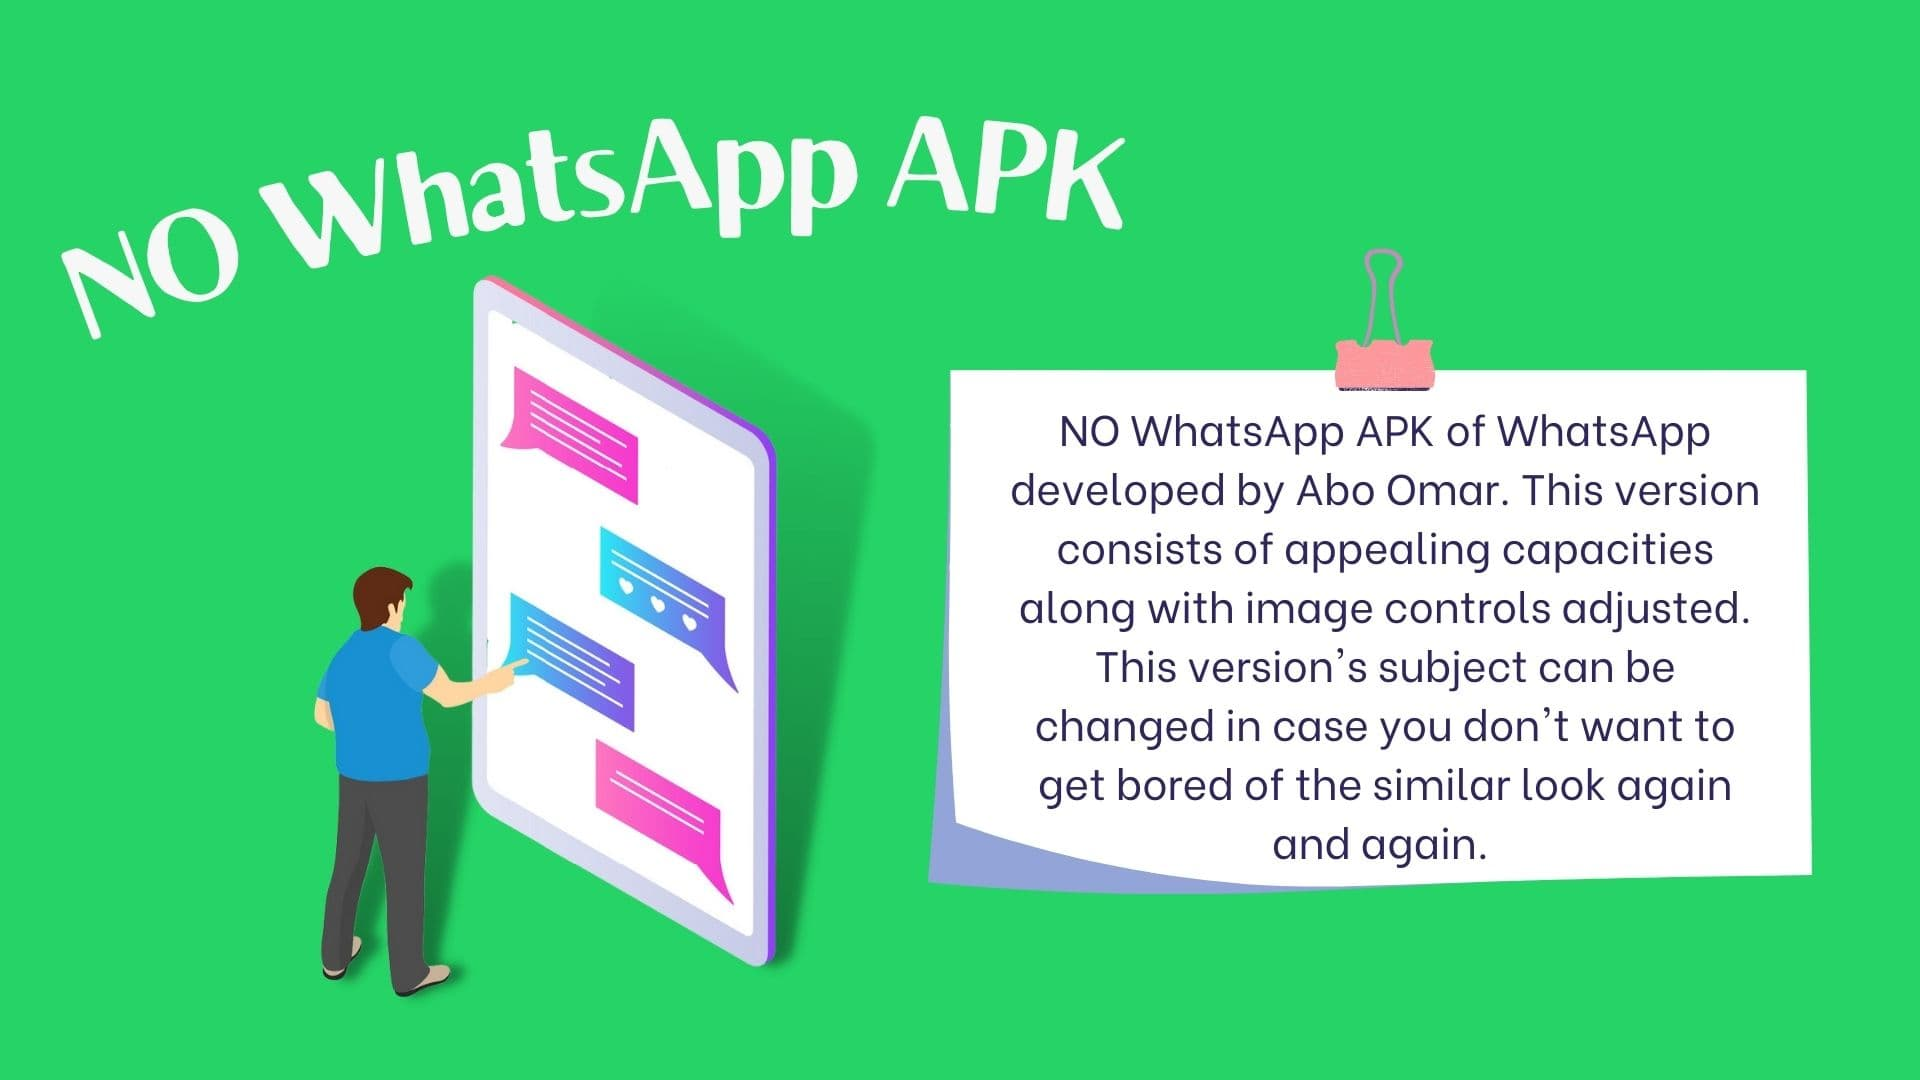 NO WhatsApp APK